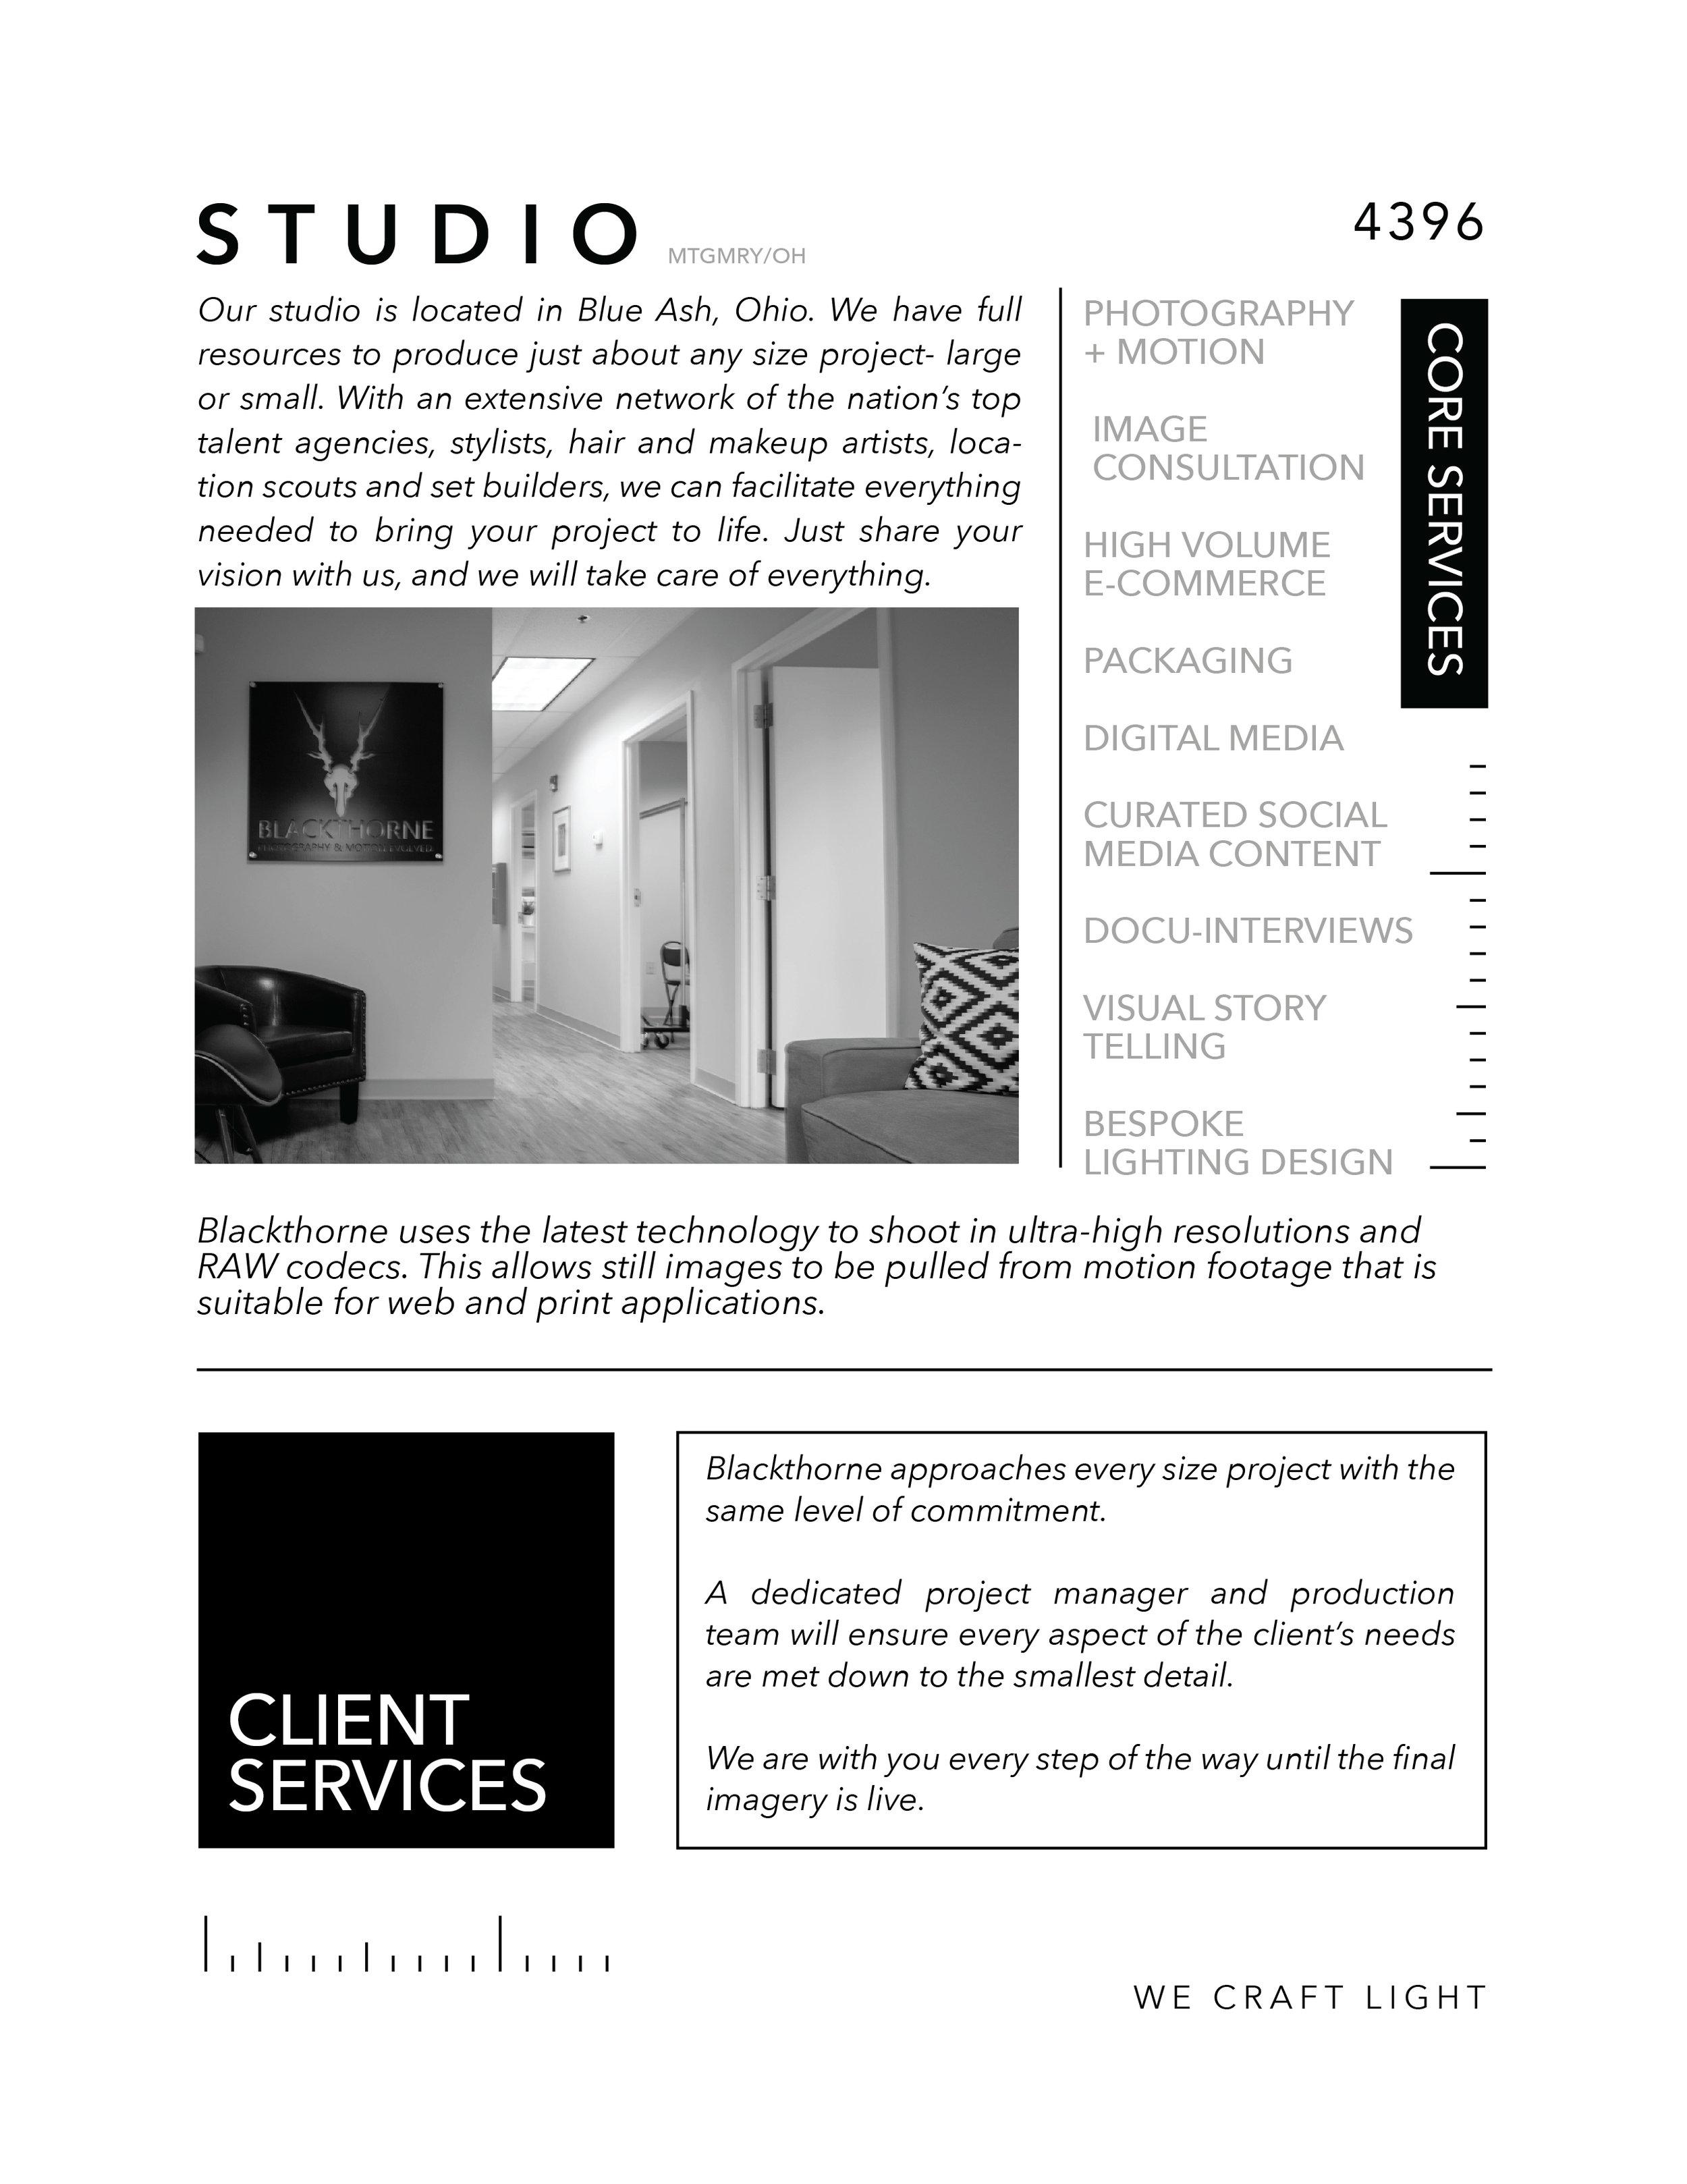 boards_STUDIO-SERVICES.jpg